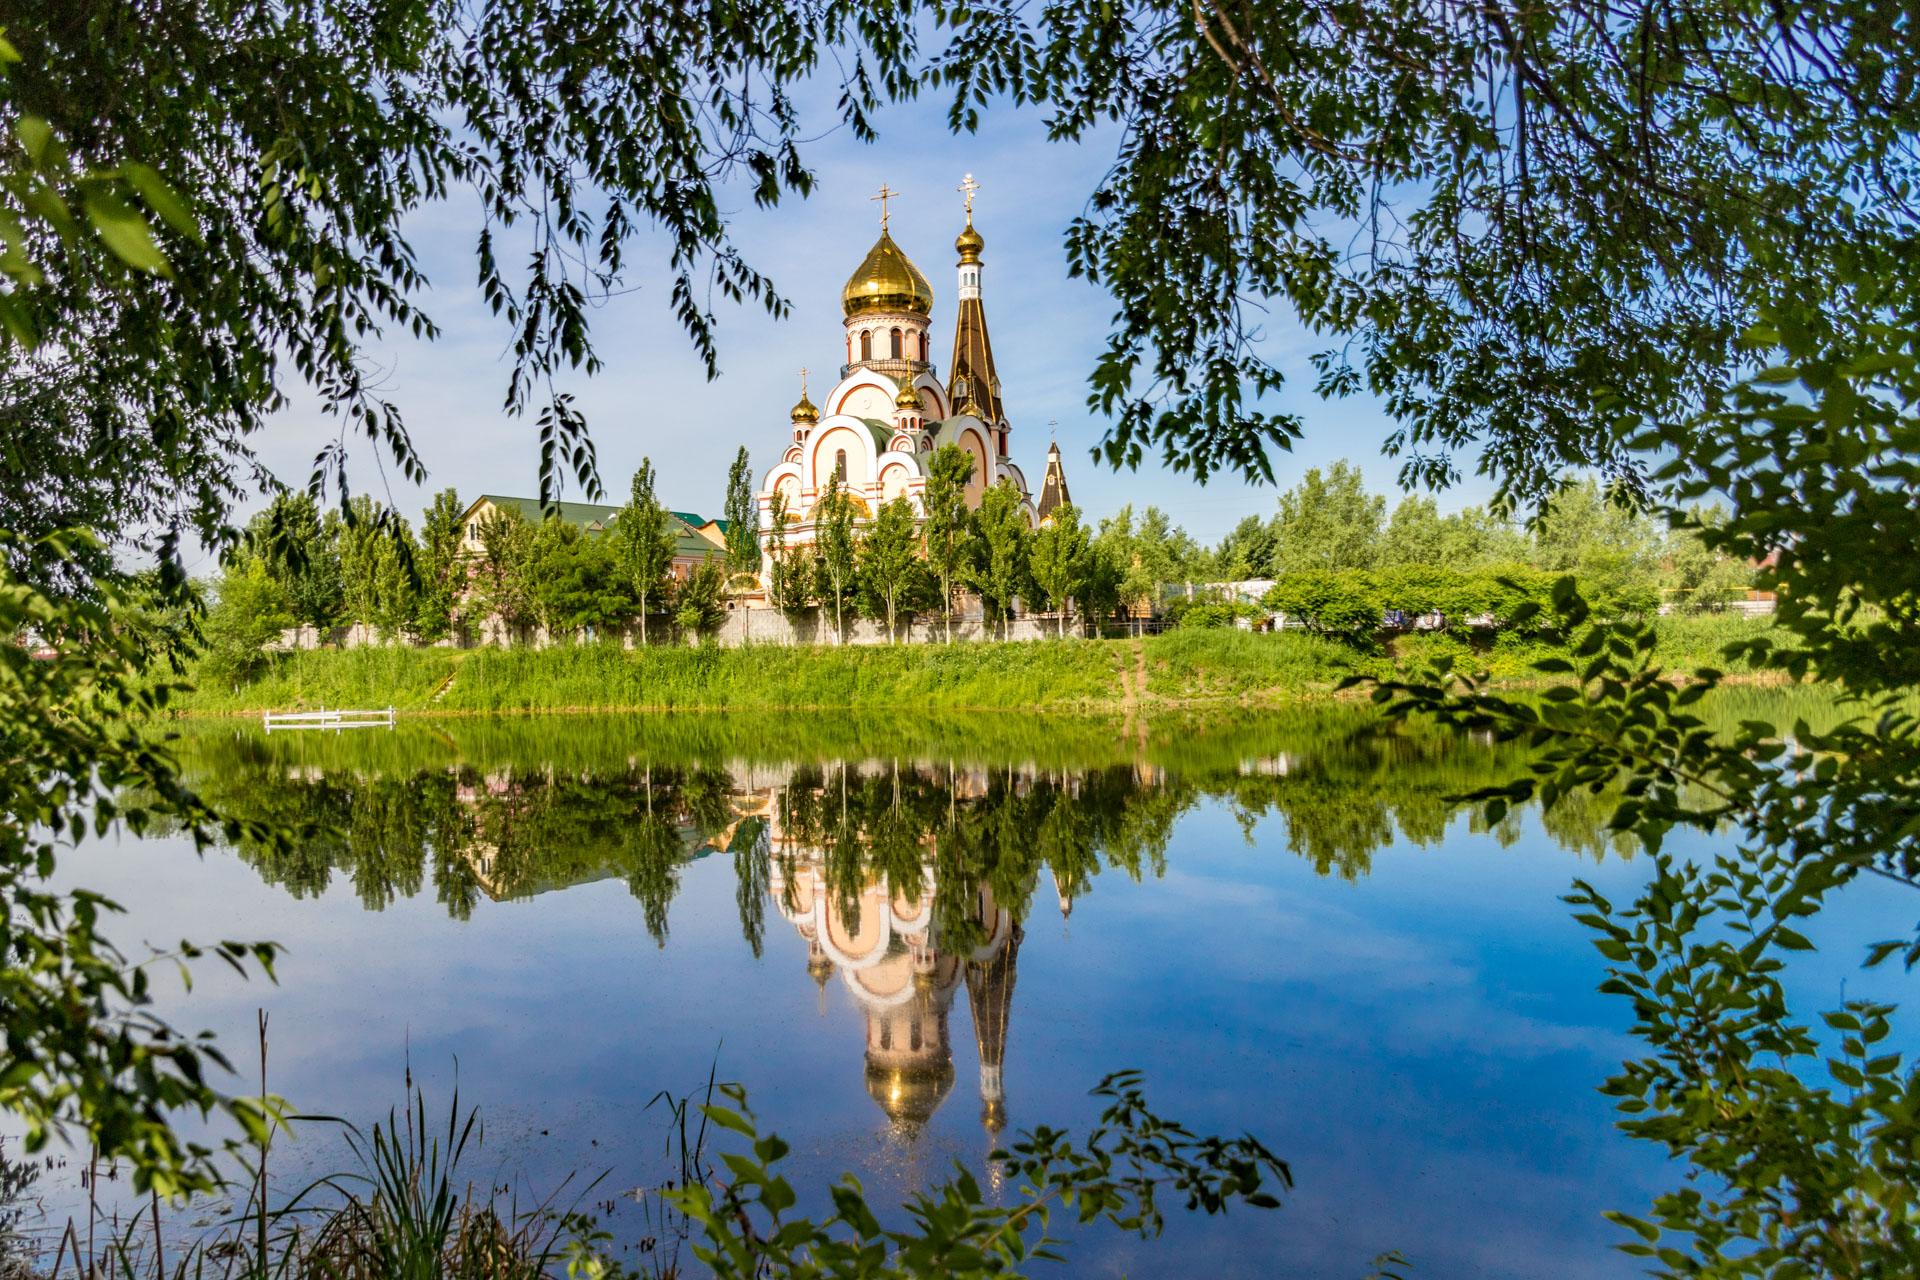 Almaty, Kazakhstan - quaint church with tree frame